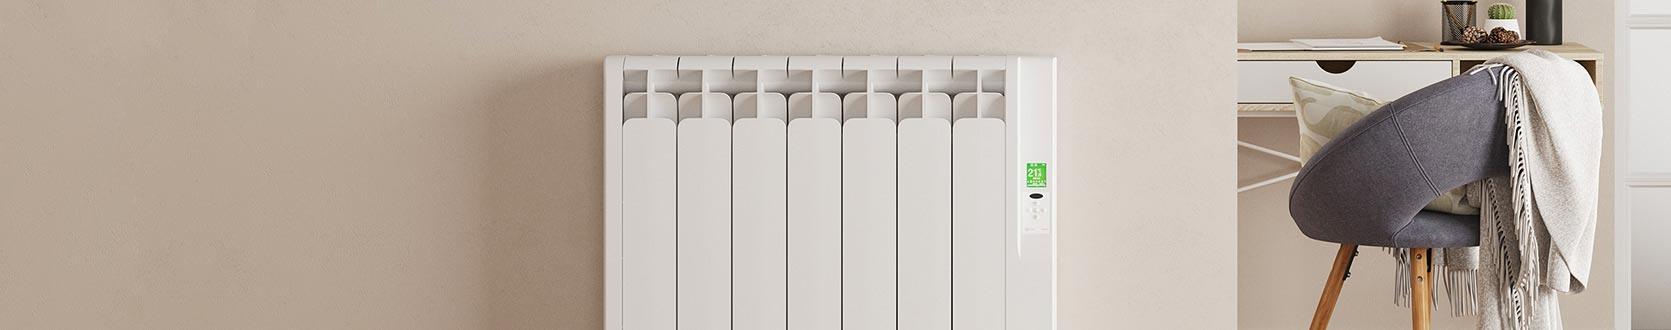 Rointe Kyros electric radiator wall mounted in hallway